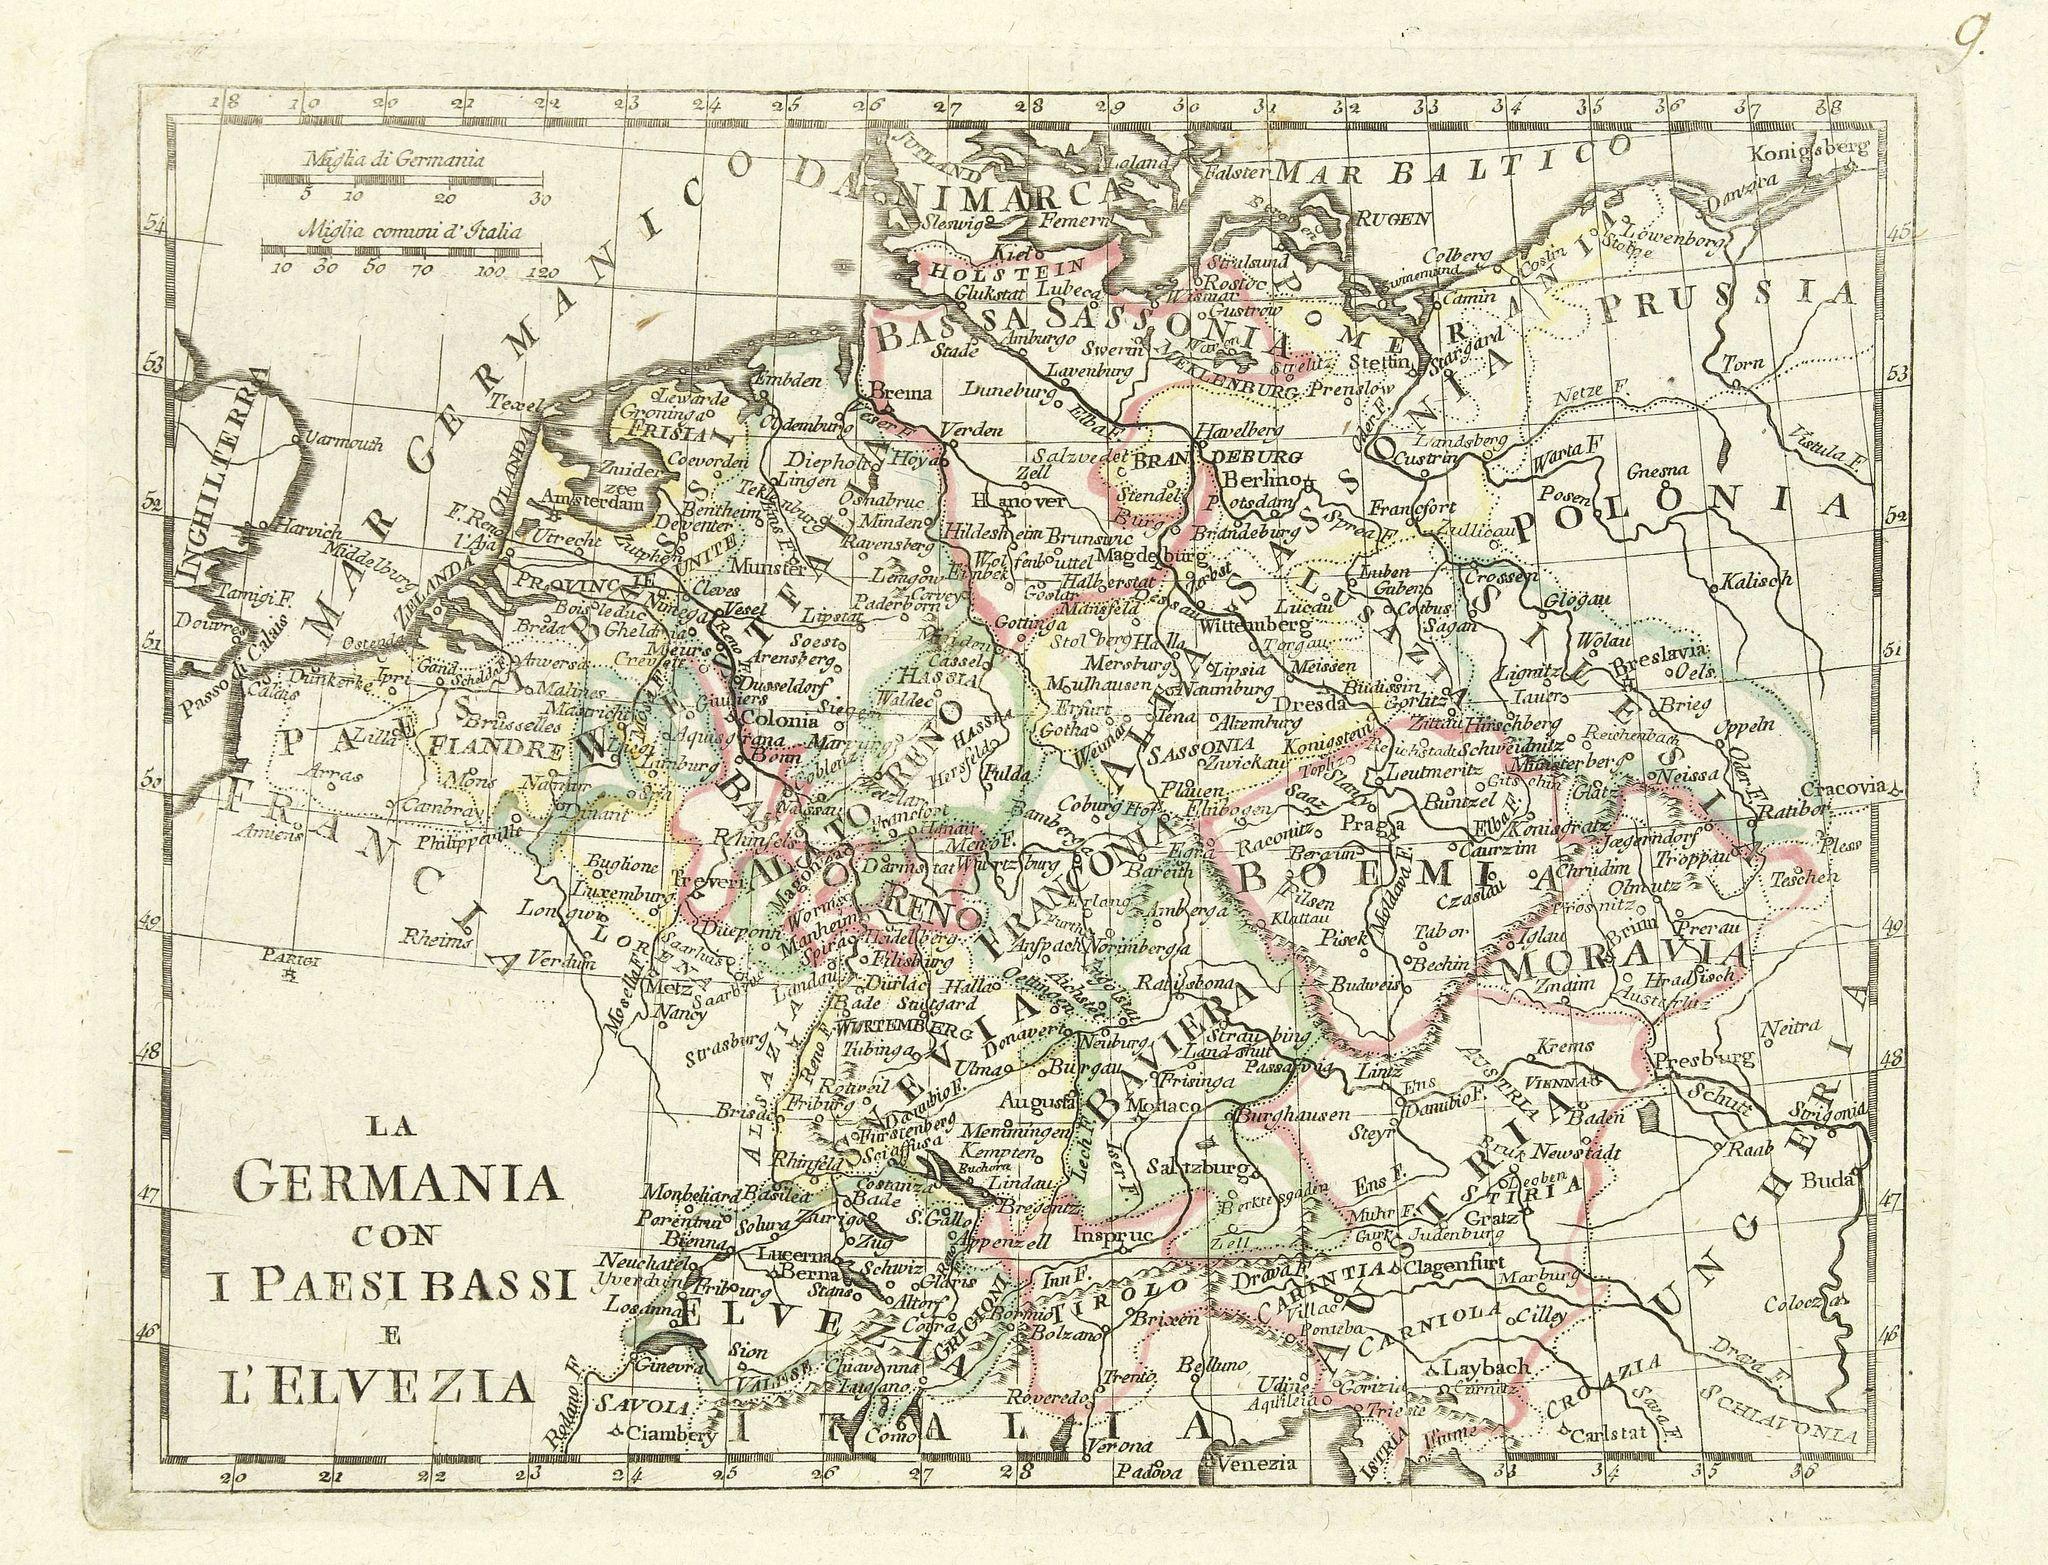 OLIVIERI -  La germania con i paesi bassi e l'elvezia.